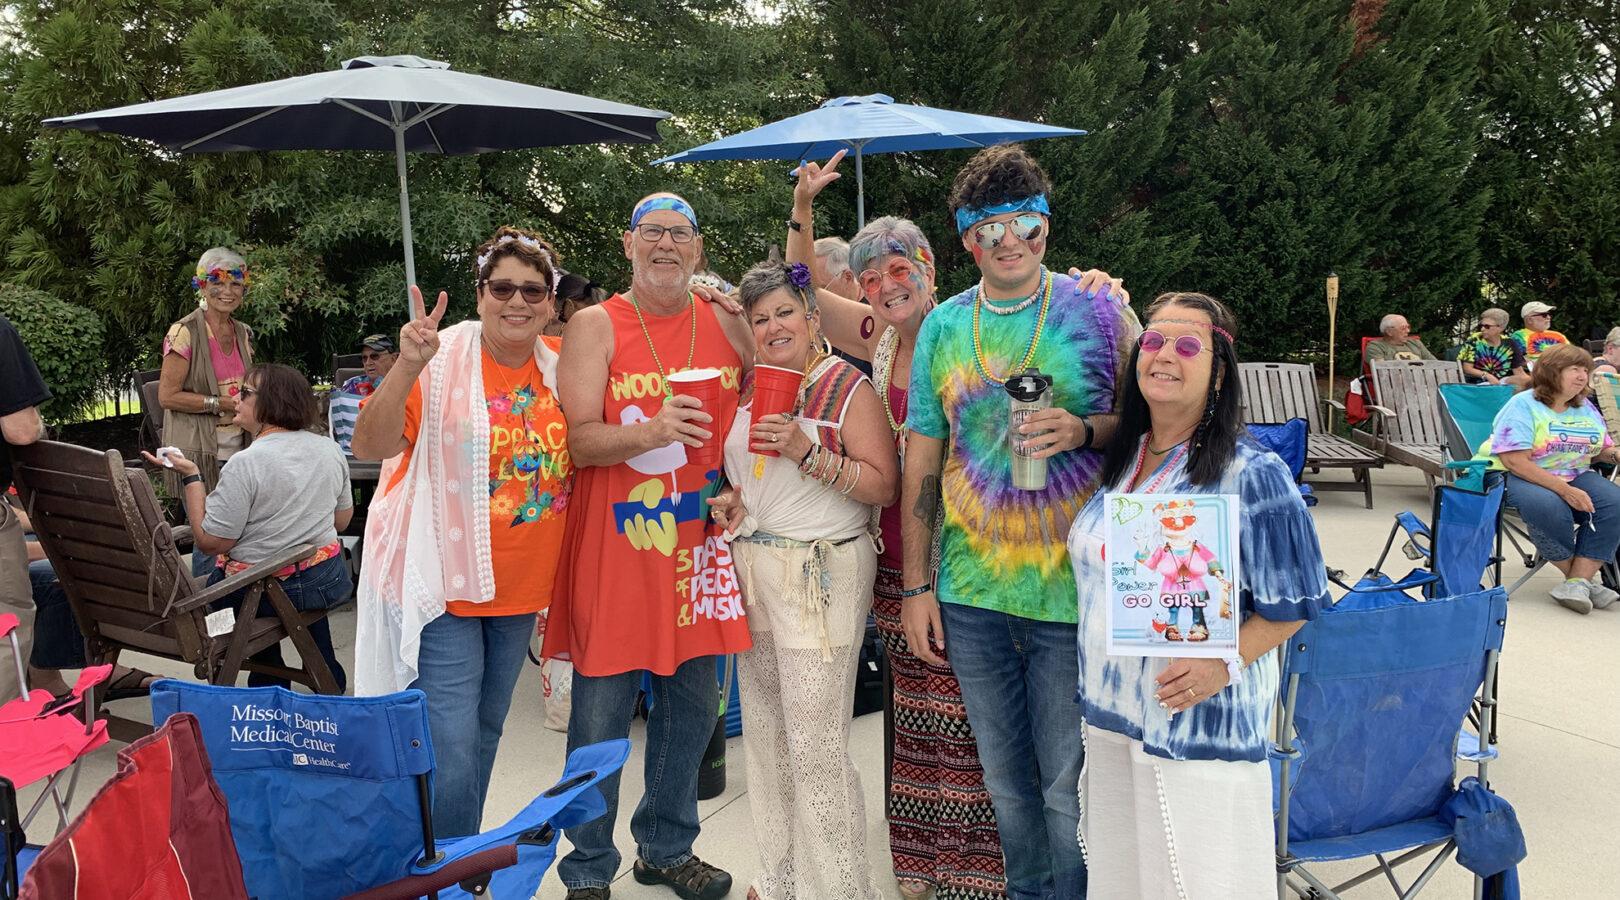 NoblesPond-Woodstock-Party-1980